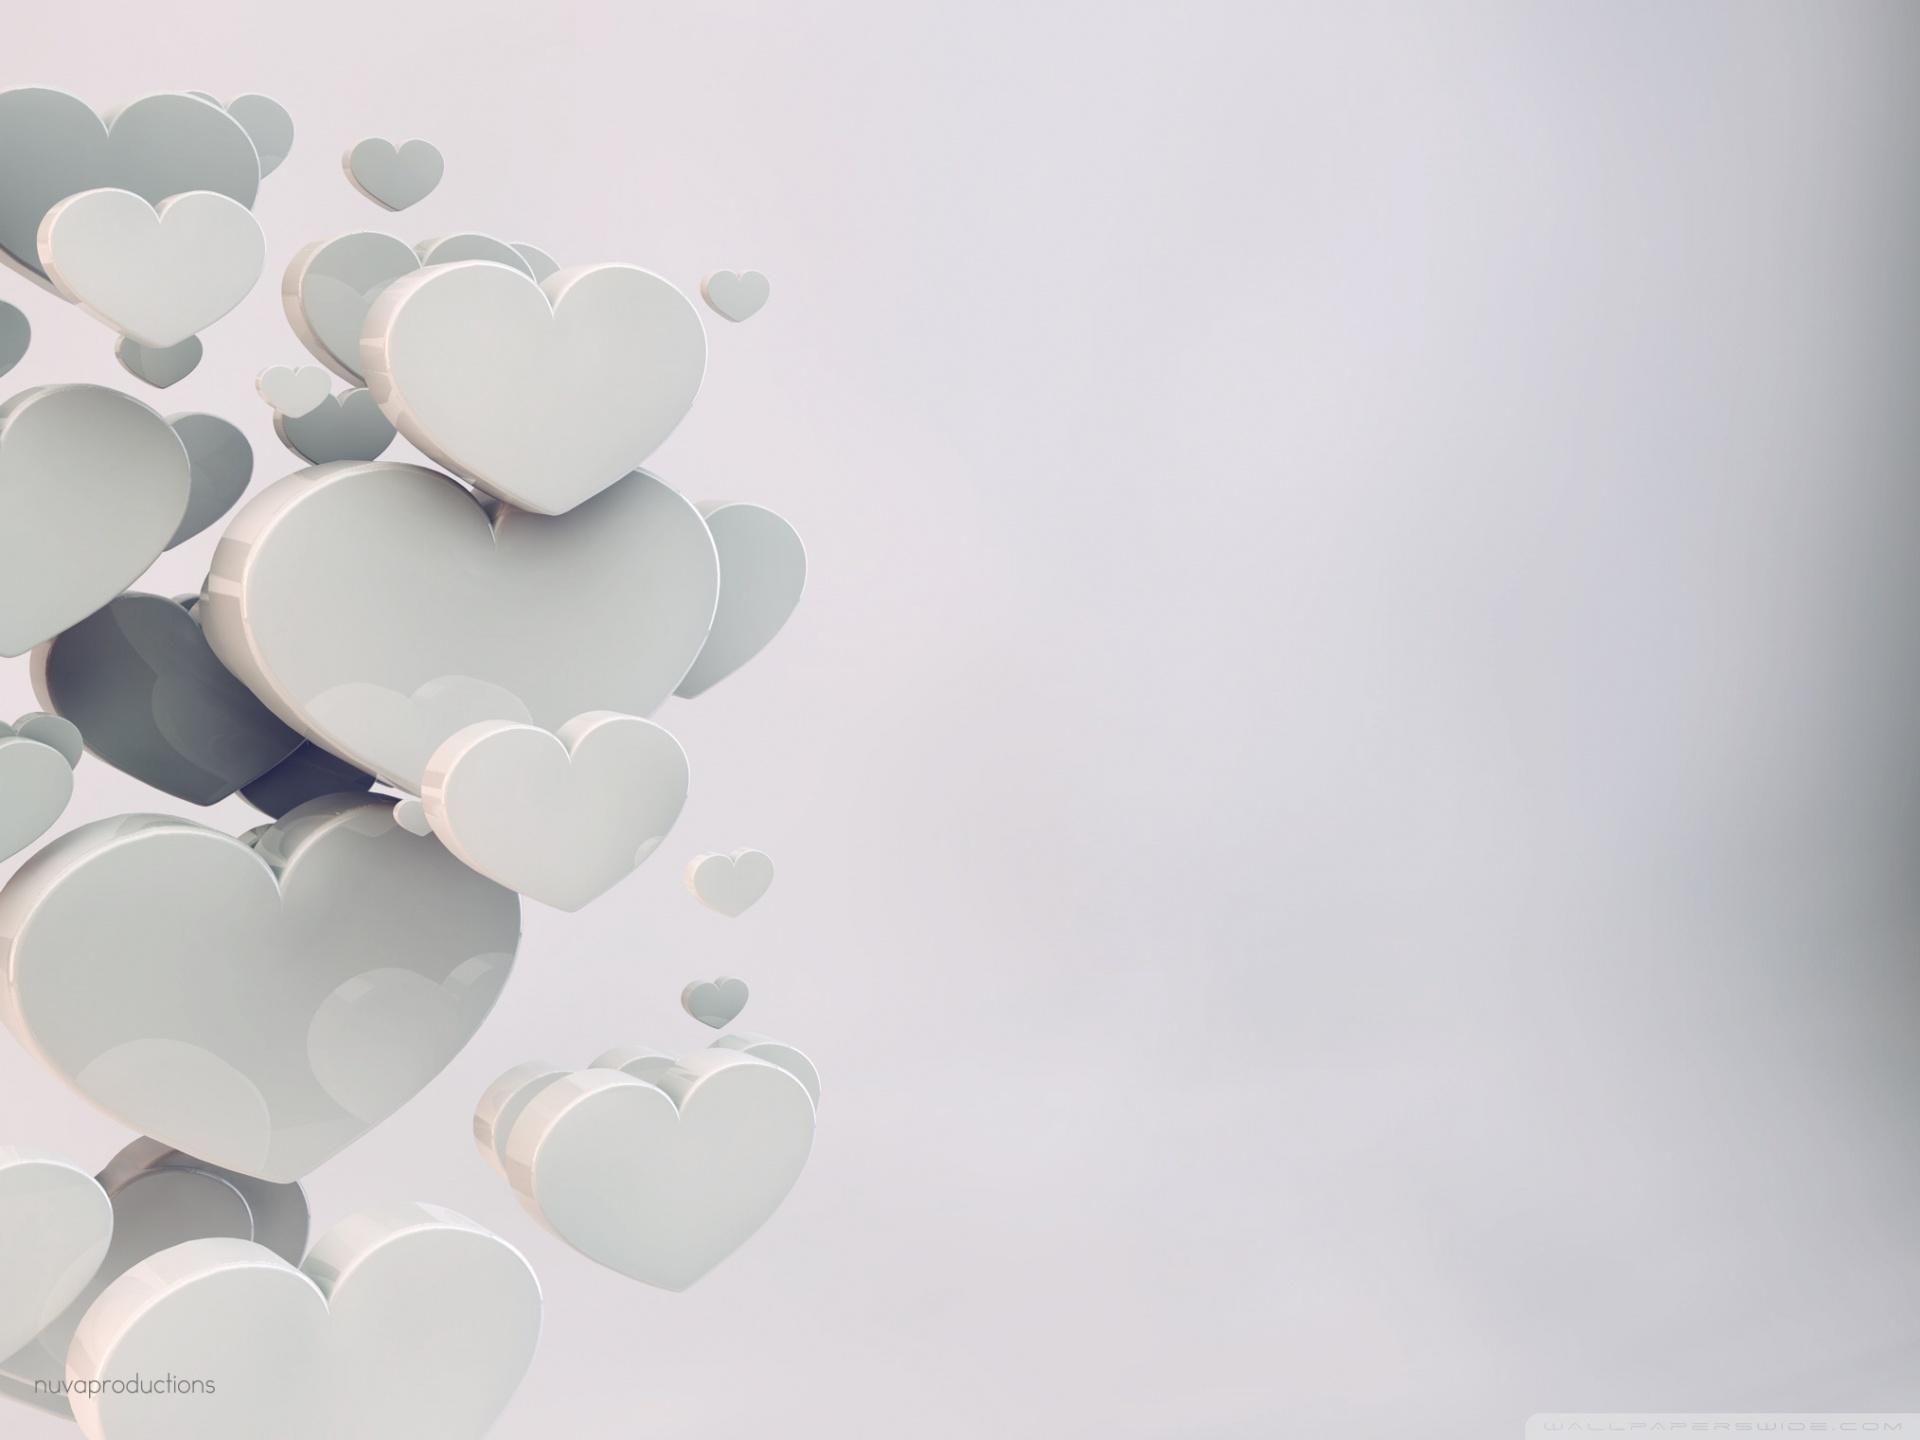 Wedding wallpaper 1920x1200 82191 1920x1440